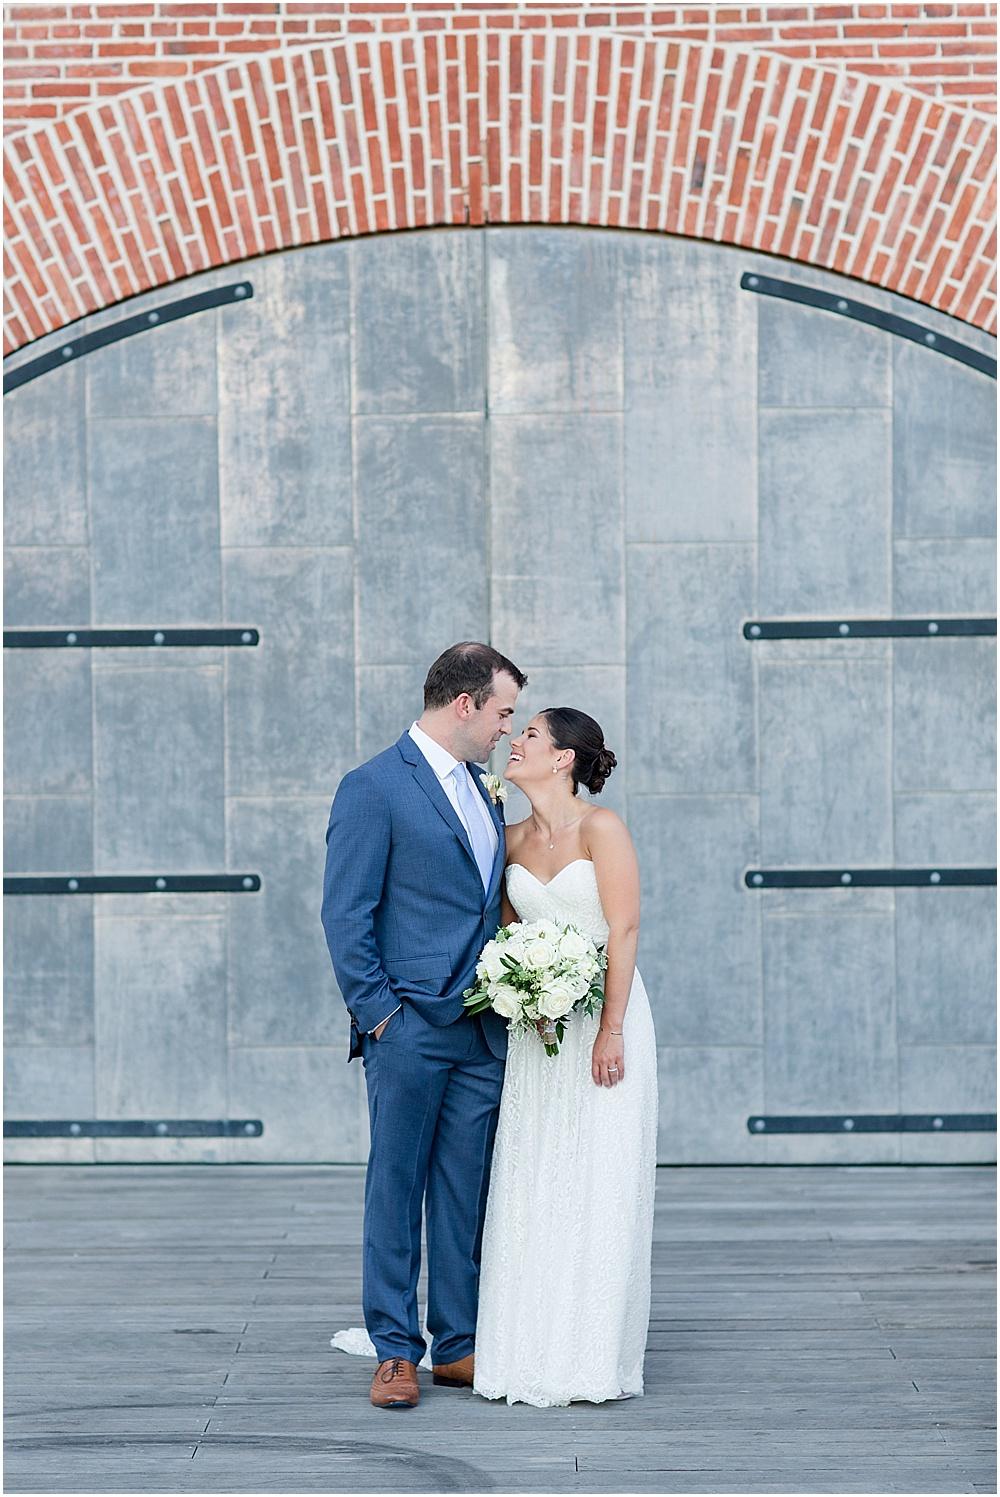 liz_robert_frederick_douglass_maritime_museum_baltimore_wedding_photographer_0079